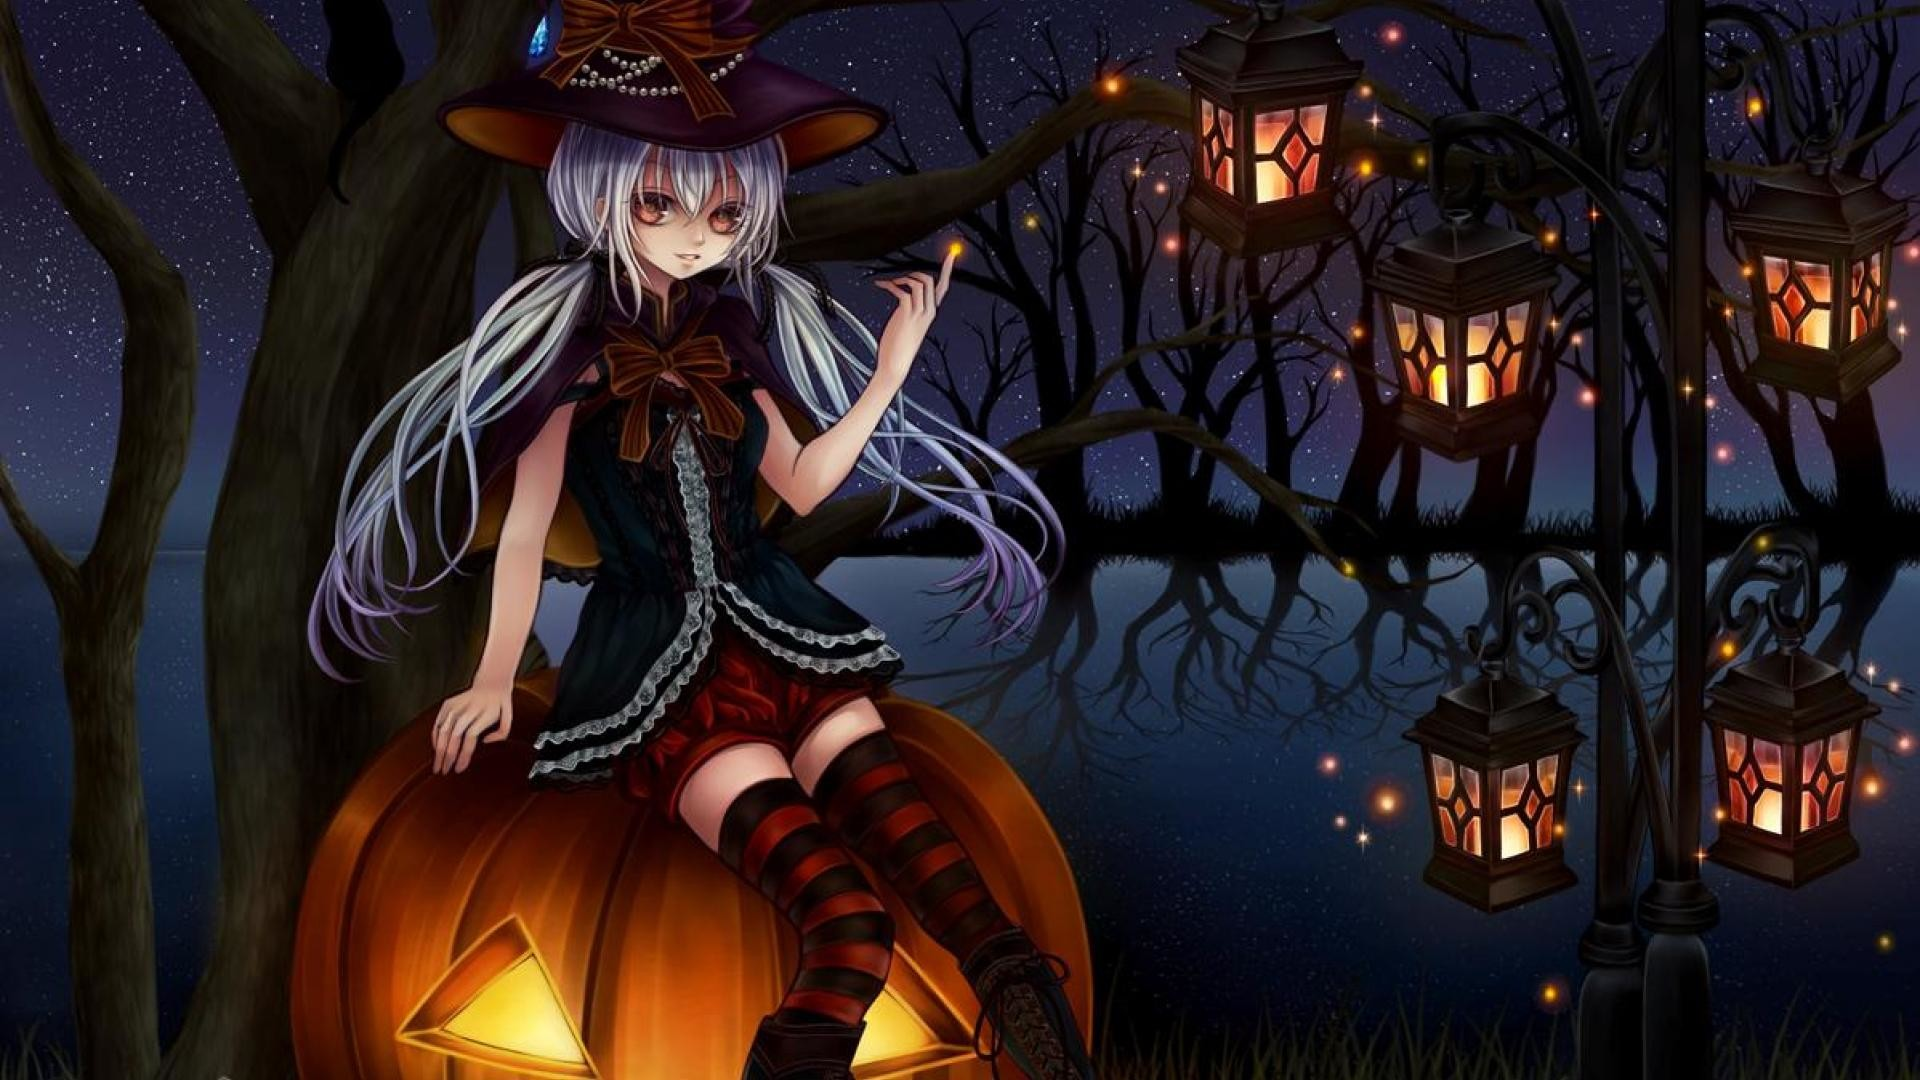 Anime Halloween Wallpaper 15 | Fastwallz.com